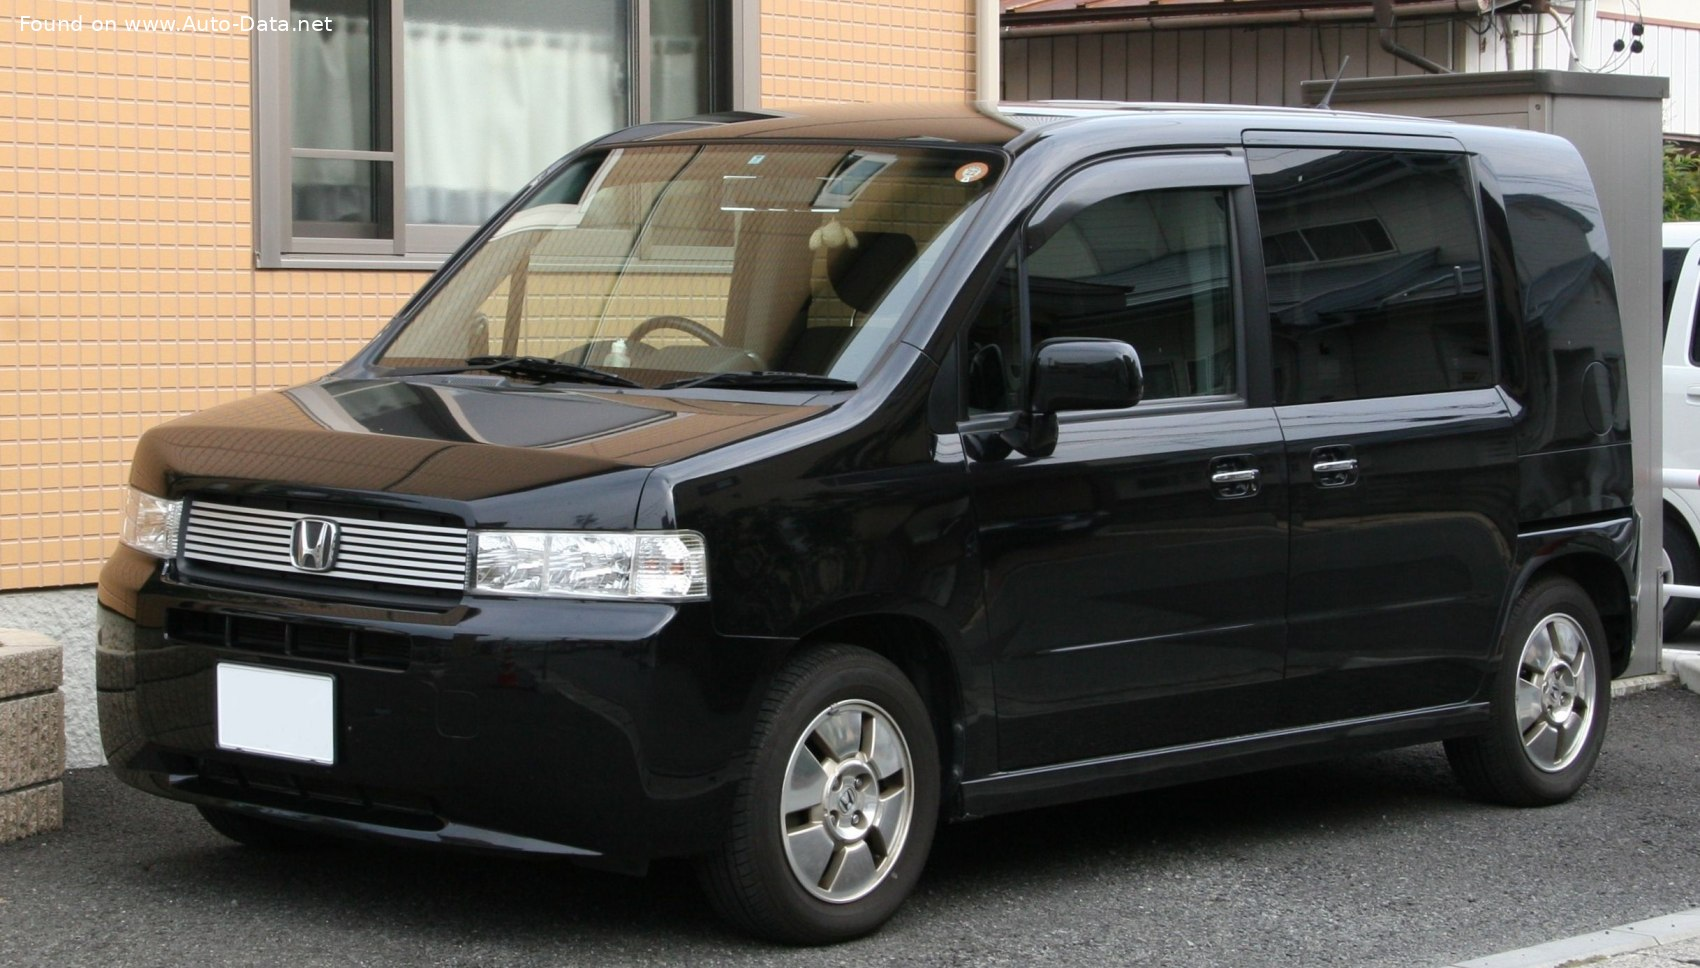 2002 Honda Mobilio Spike 1.5 i 16V (110 CH) | Fiche technique, consommation de carburant ...